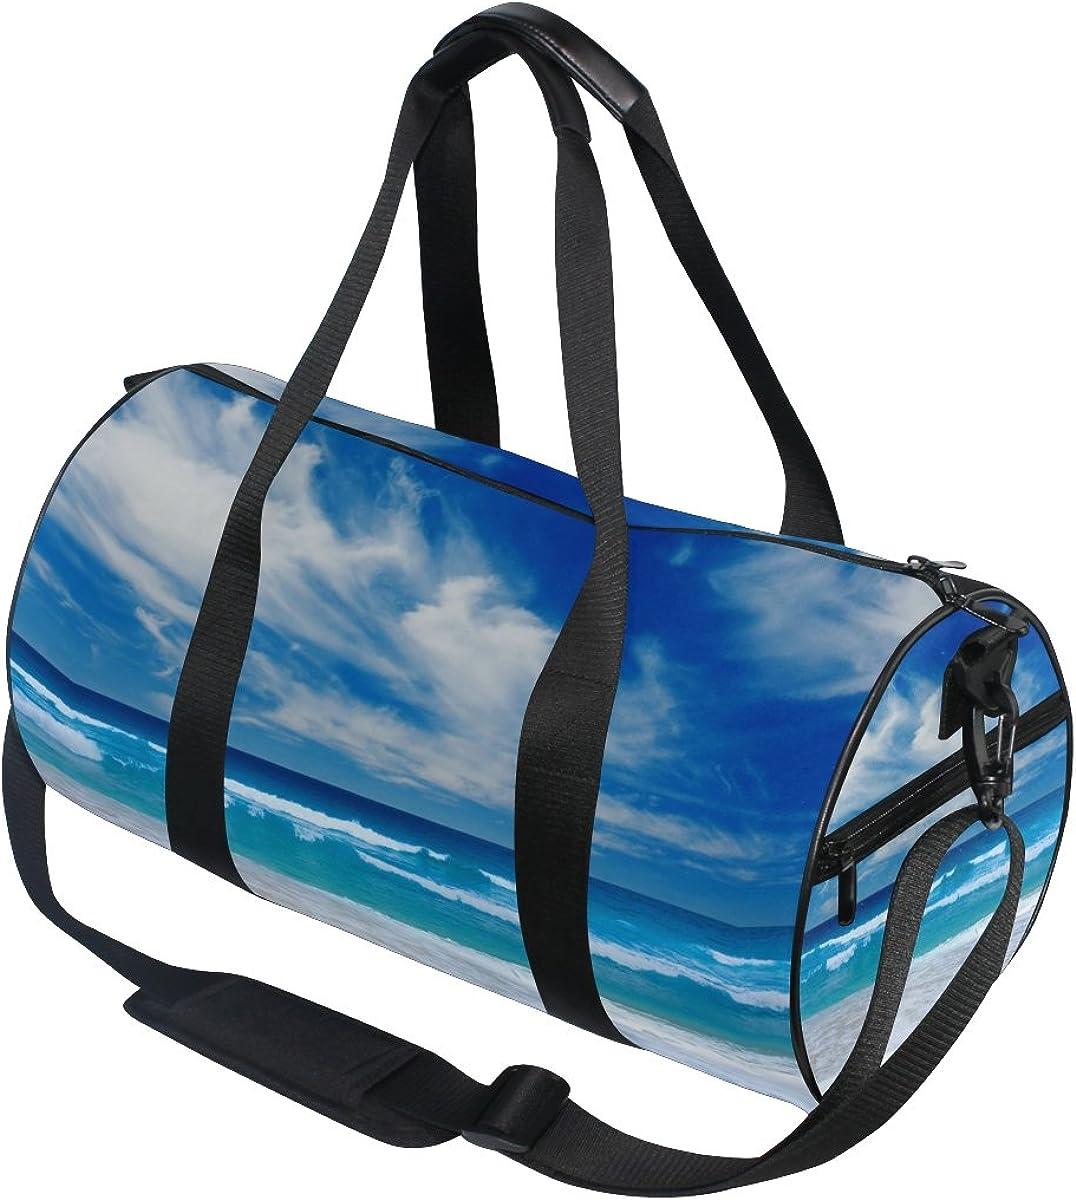 AHOMY Canvas Sports Gym Bag Beach Seawave Sunshine Blue Sky Travel Shoulder Bag